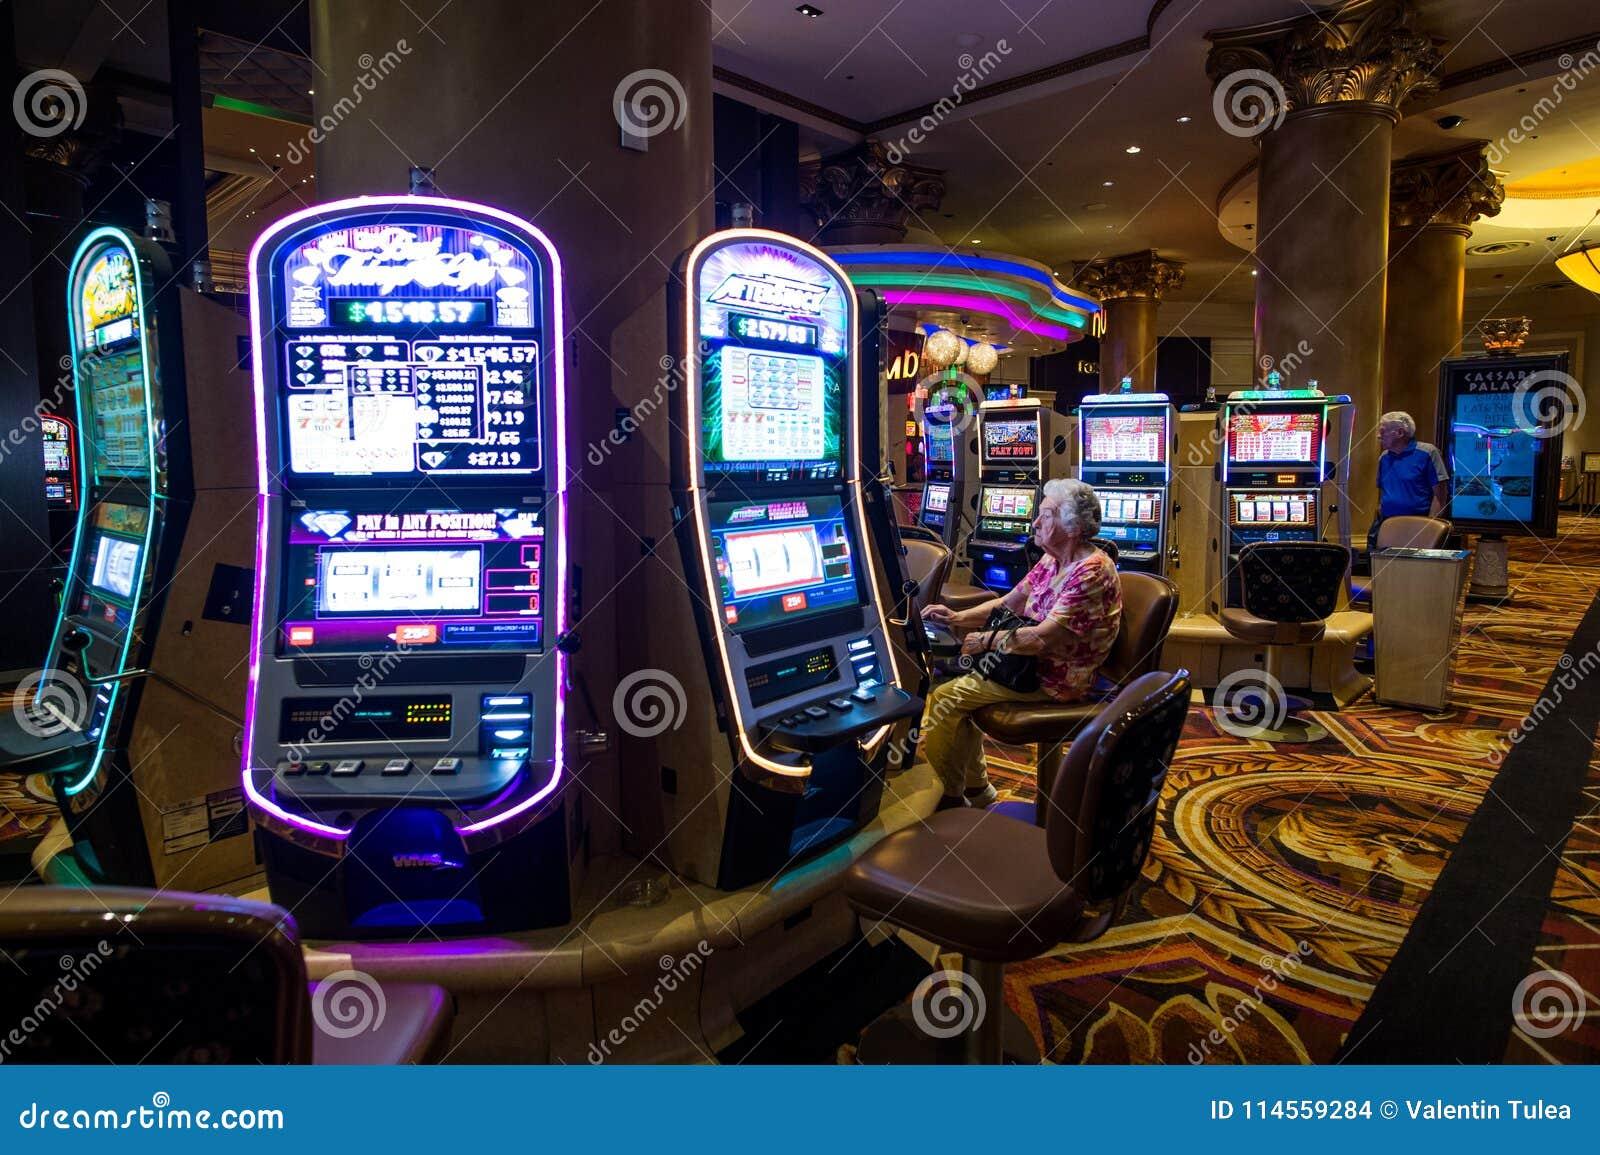 Global poker site